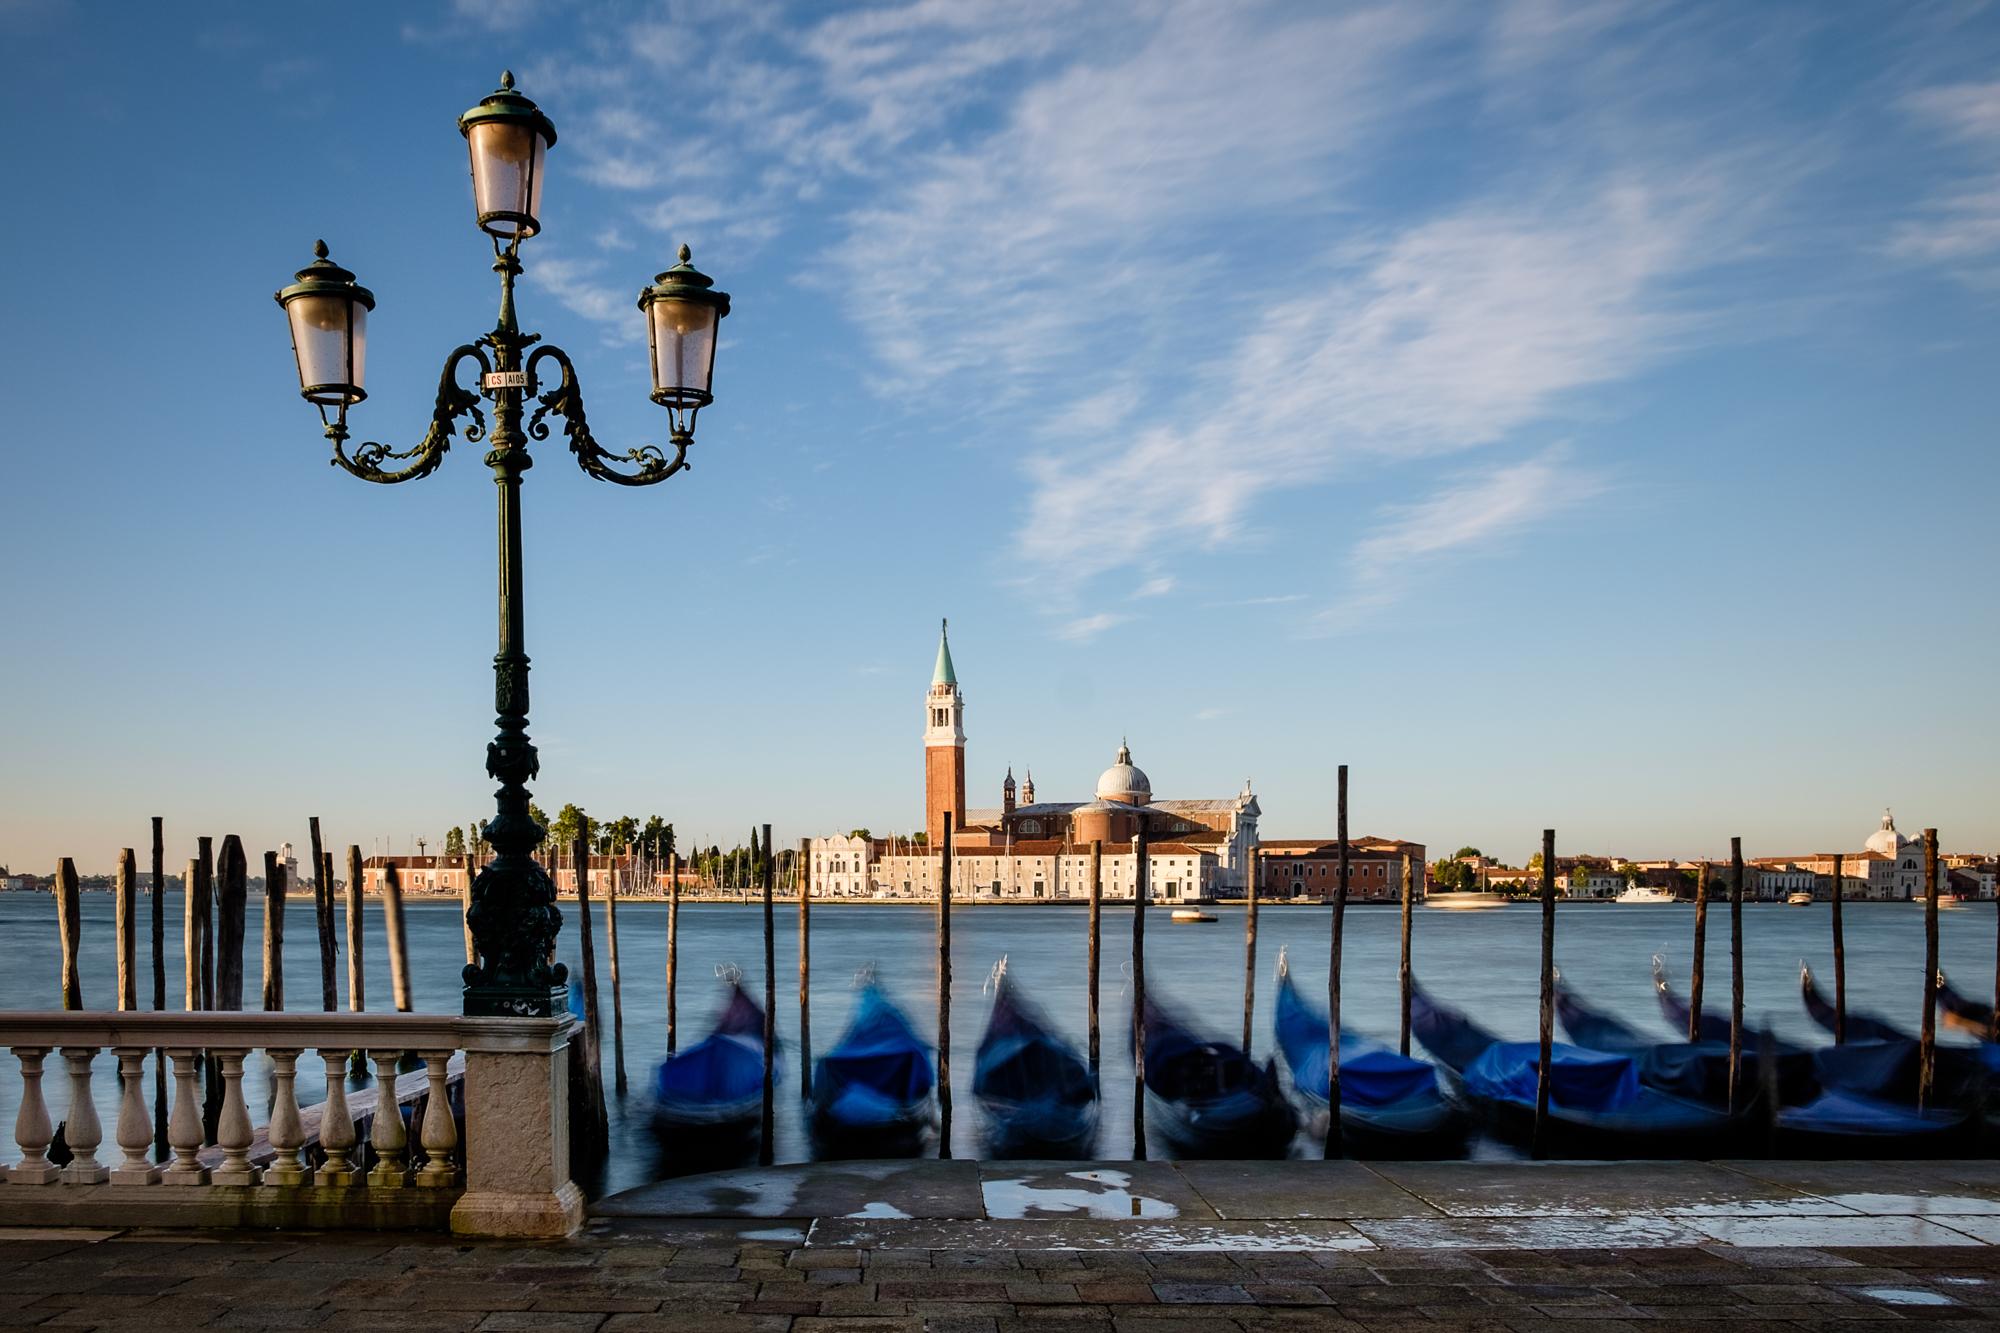 TS -170727 - Venice - 023.jpg